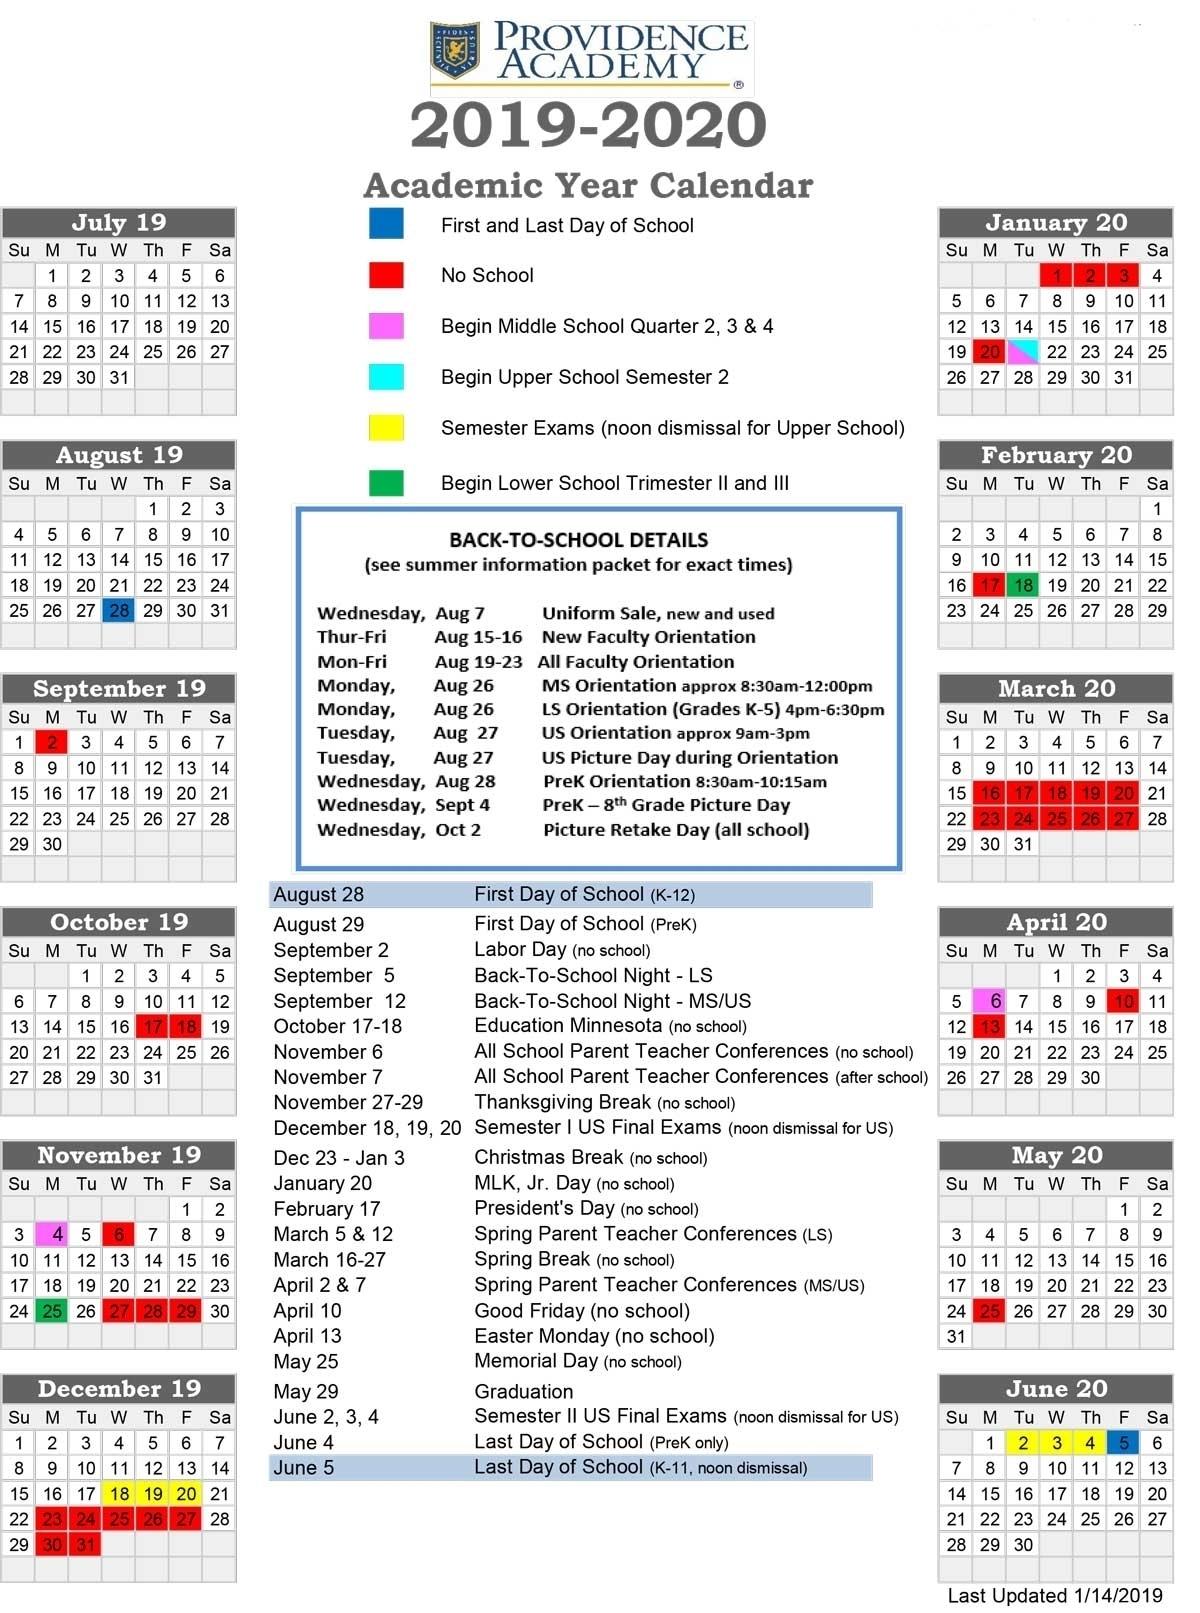 U Of M School Calendar 2020 | Calendar Design Ideas with regard to U Of M Calendar 2019-2020 School Year